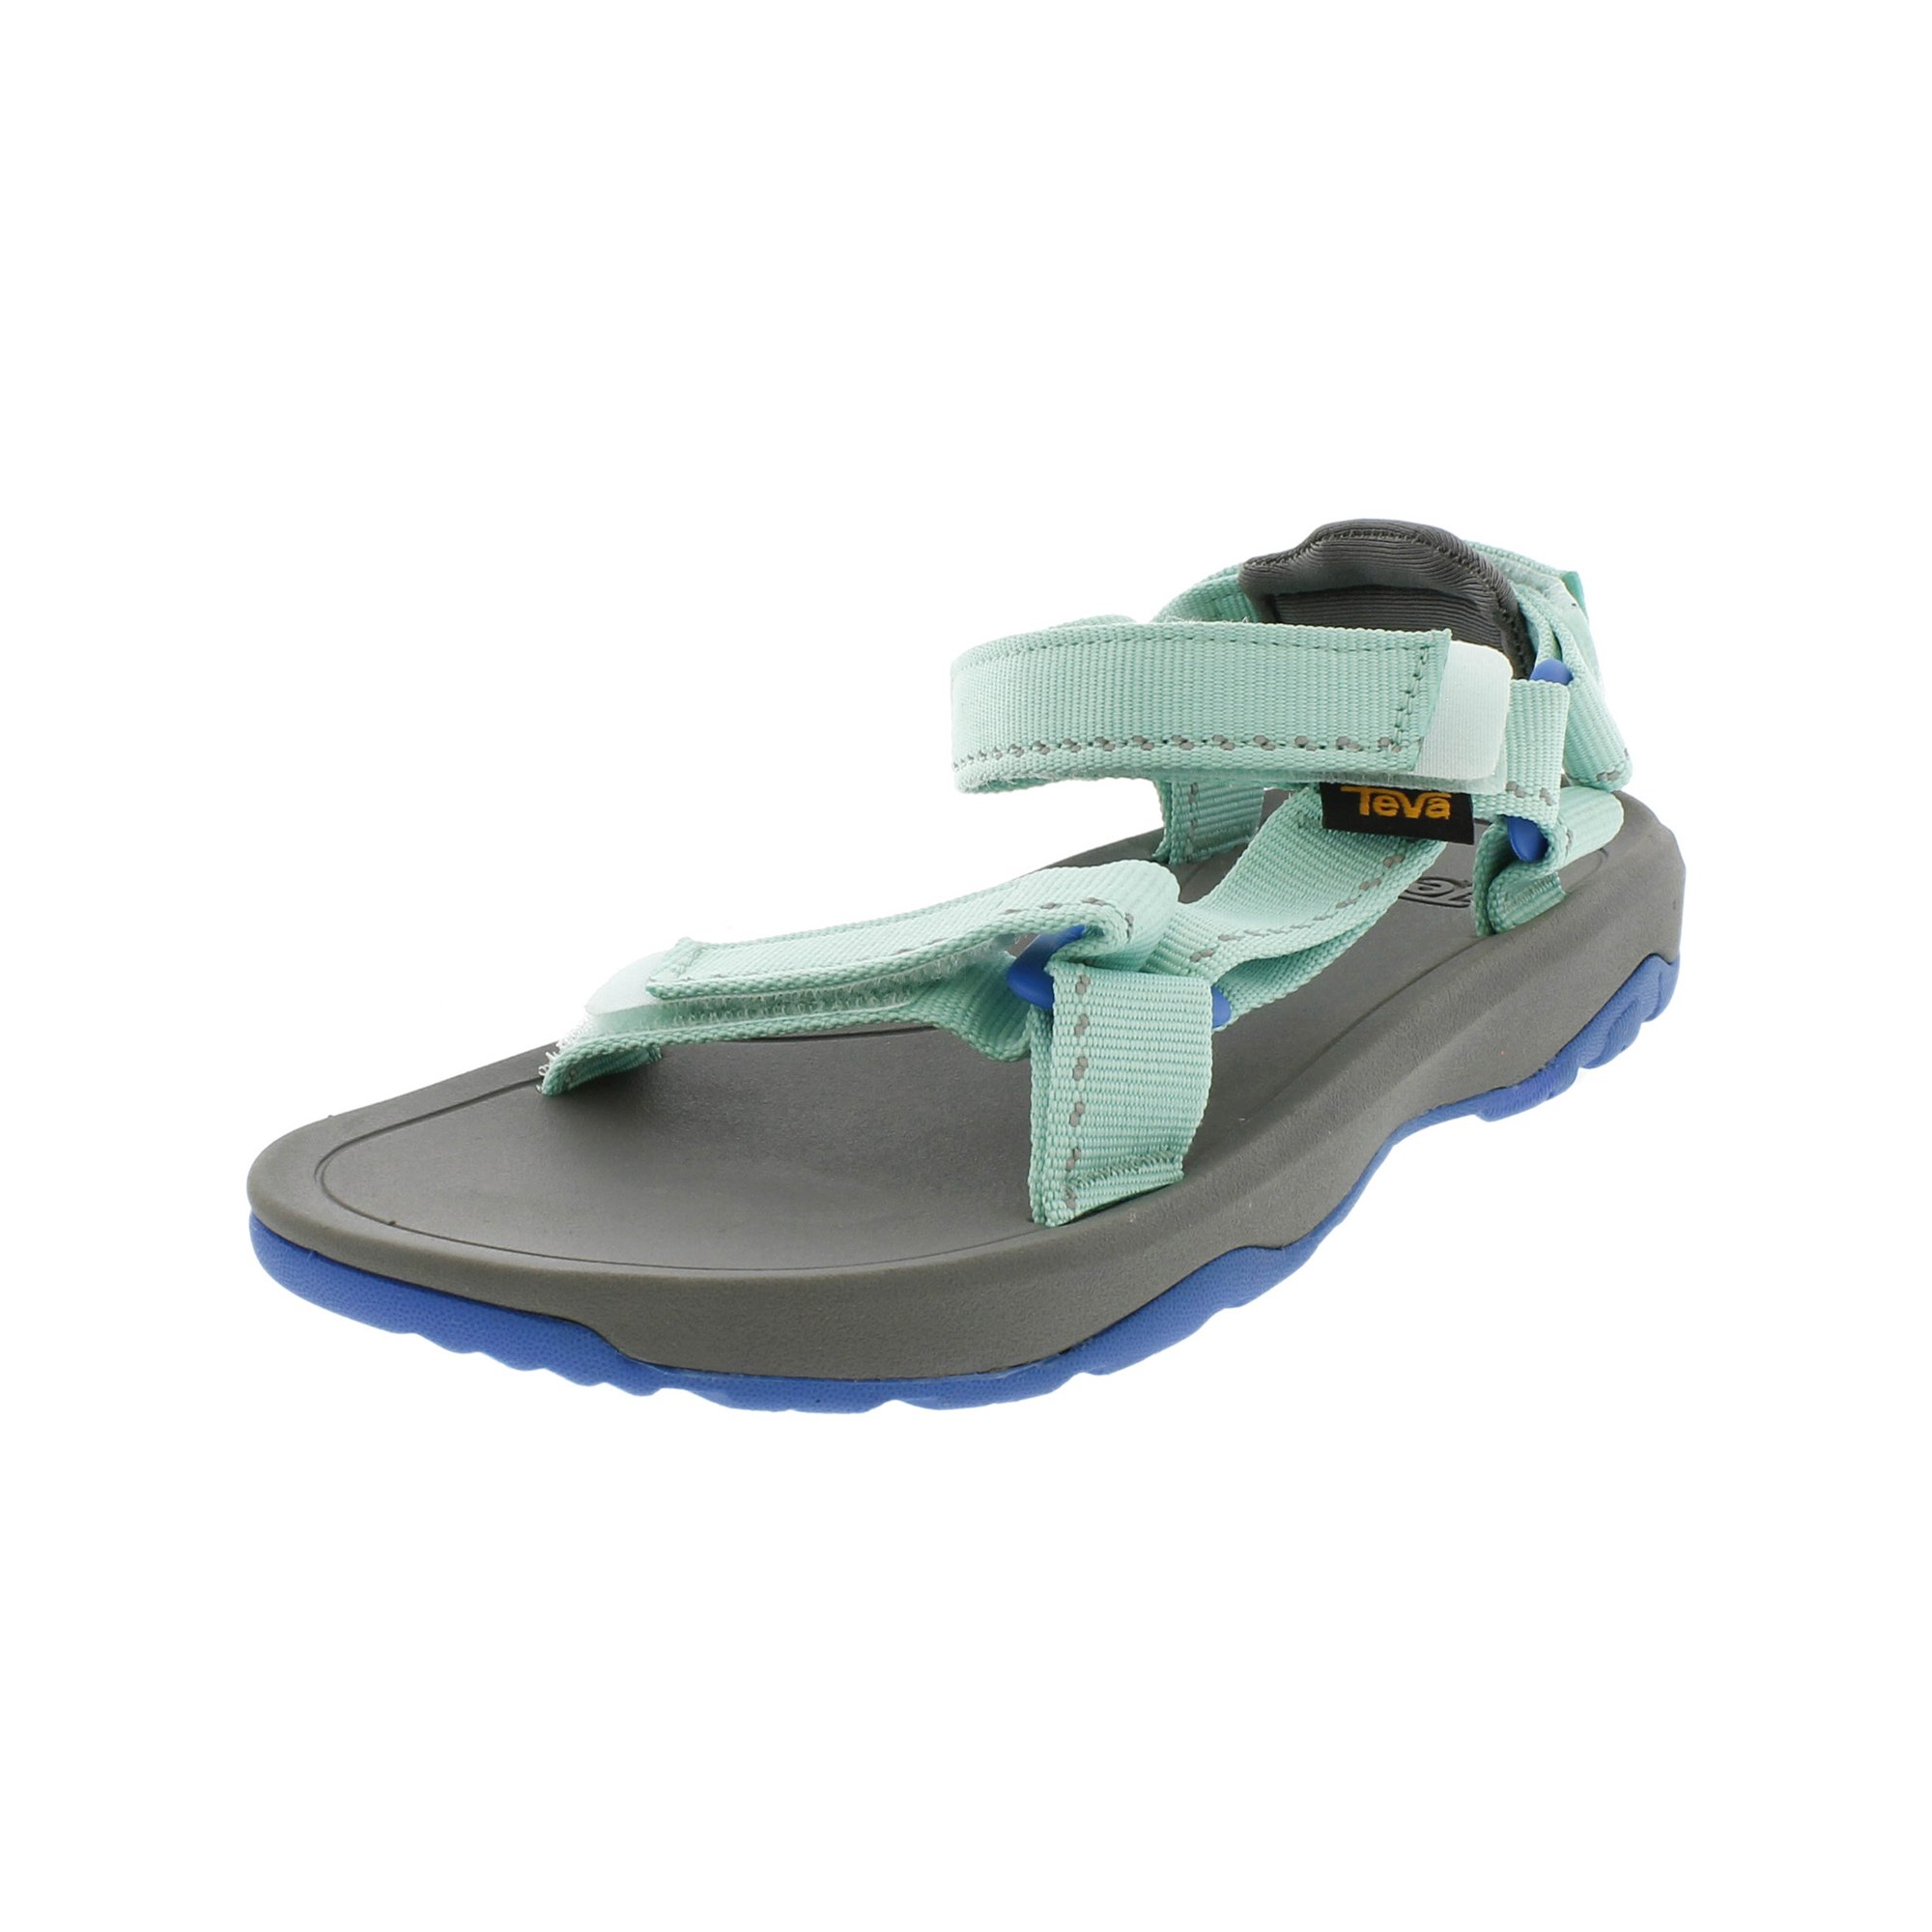 online retailer d703d 533ea Teva Hurricane Xtl 2 Speck Sea Glass Ankle-High Canvas ...